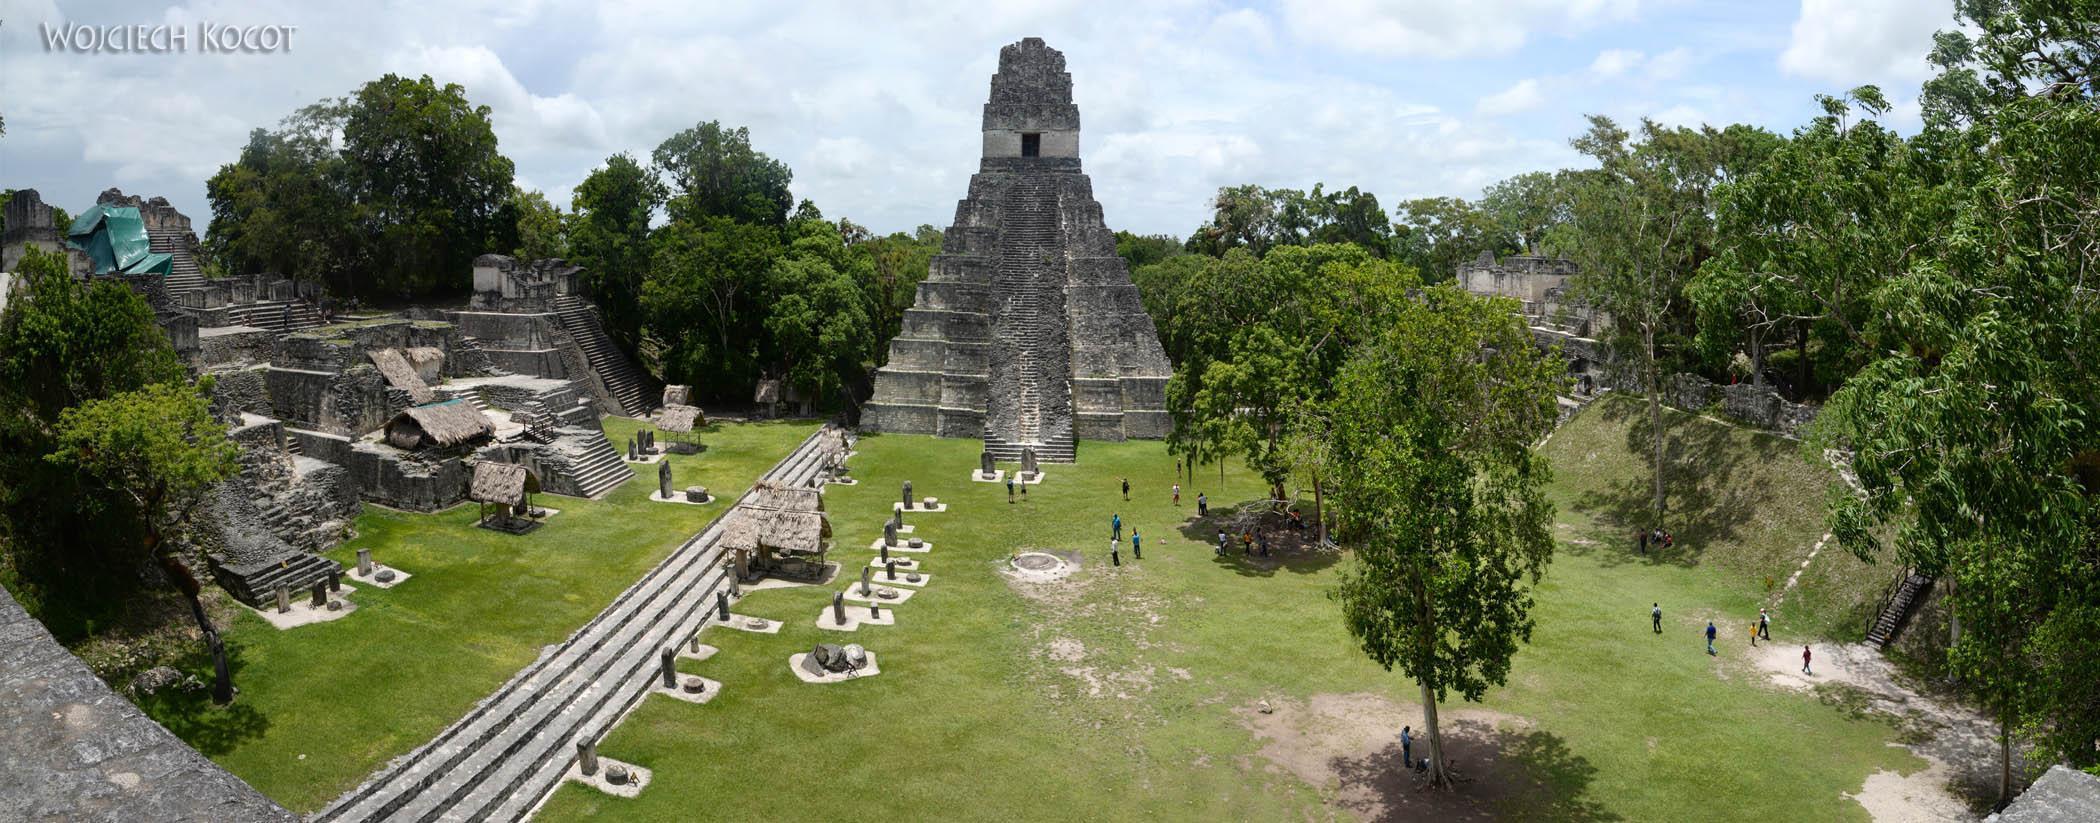 r118-Tikal-Templo I